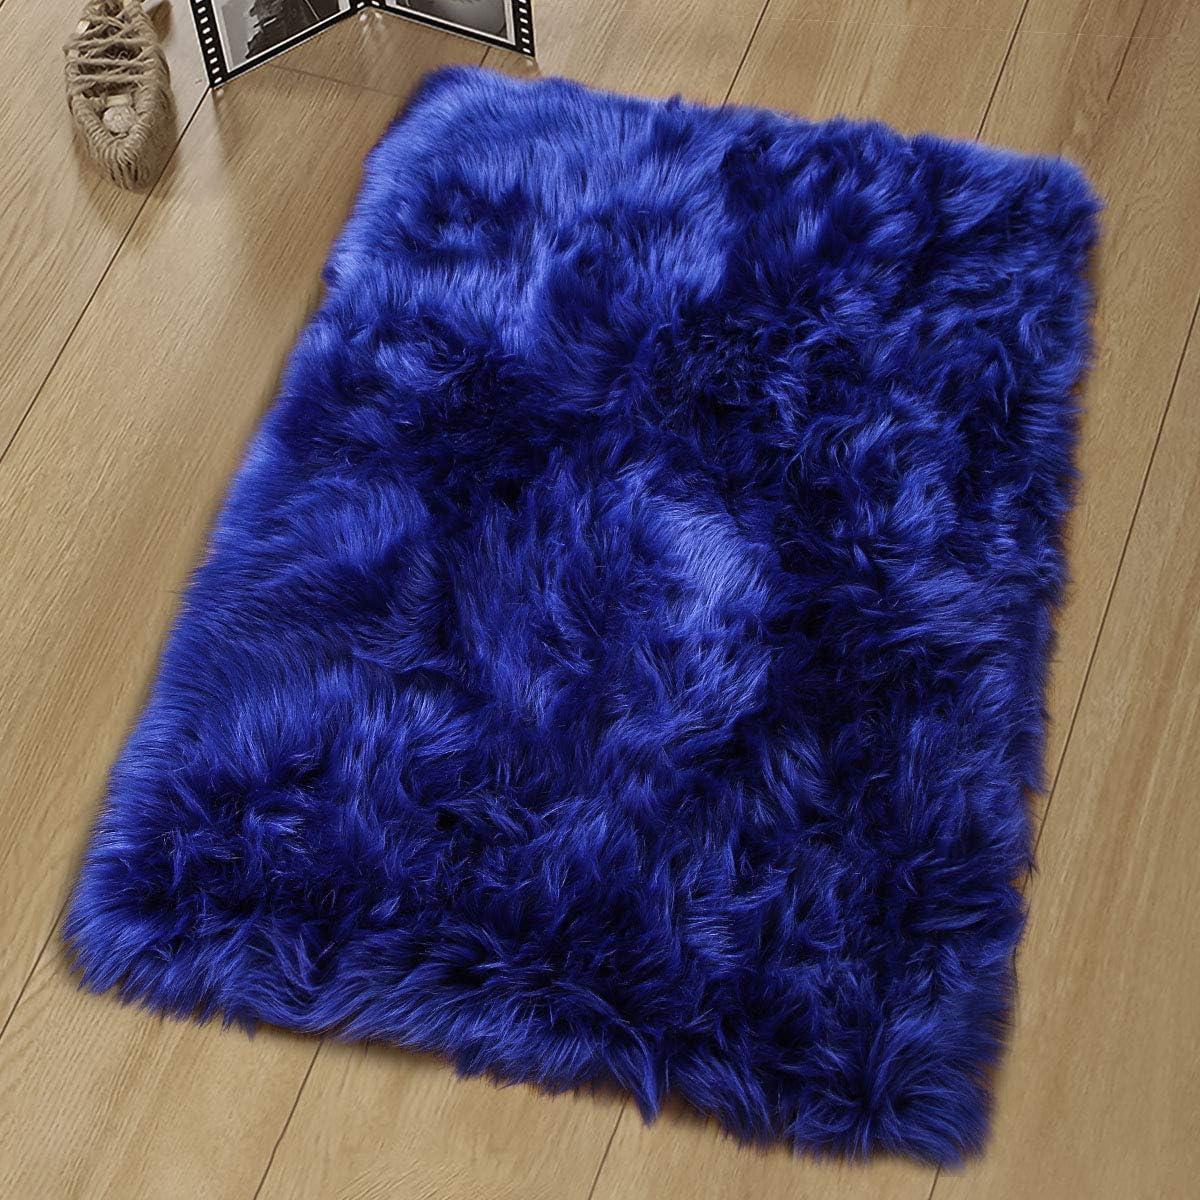 Noahas Luxury Fluffy Rugs Bedroom Furry Carpet Bedside Faux Fur Sheepskin Area Rugs Children Play Princess Room Decor Rug, 2ft x 3ft, Navy Blue